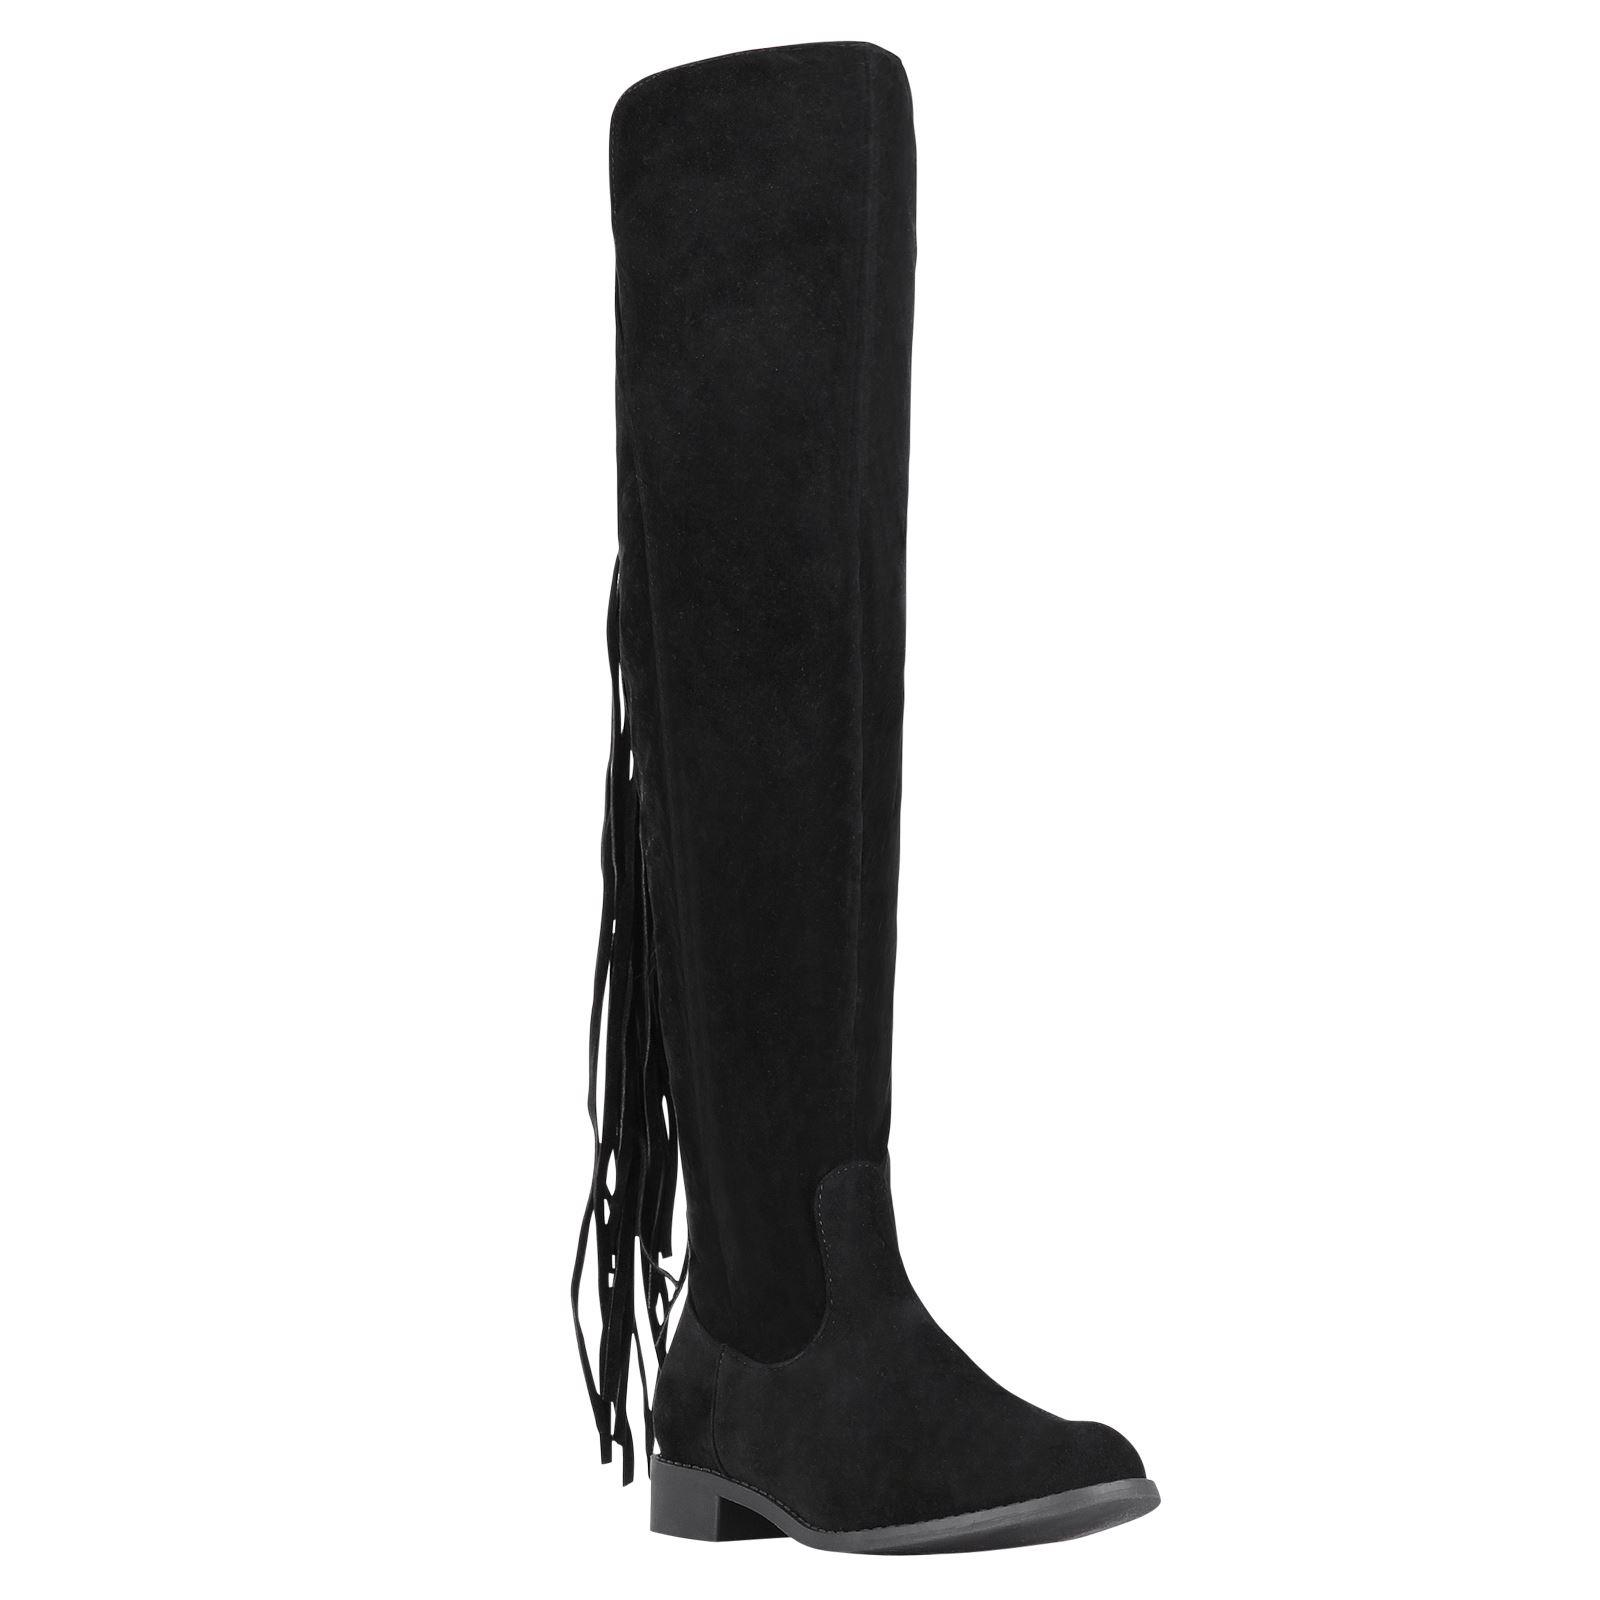 damen frauen kniehohe stiefel fransen wildleder imitat boots hohe winterschuhe ebay. Black Bedroom Furniture Sets. Home Design Ideas